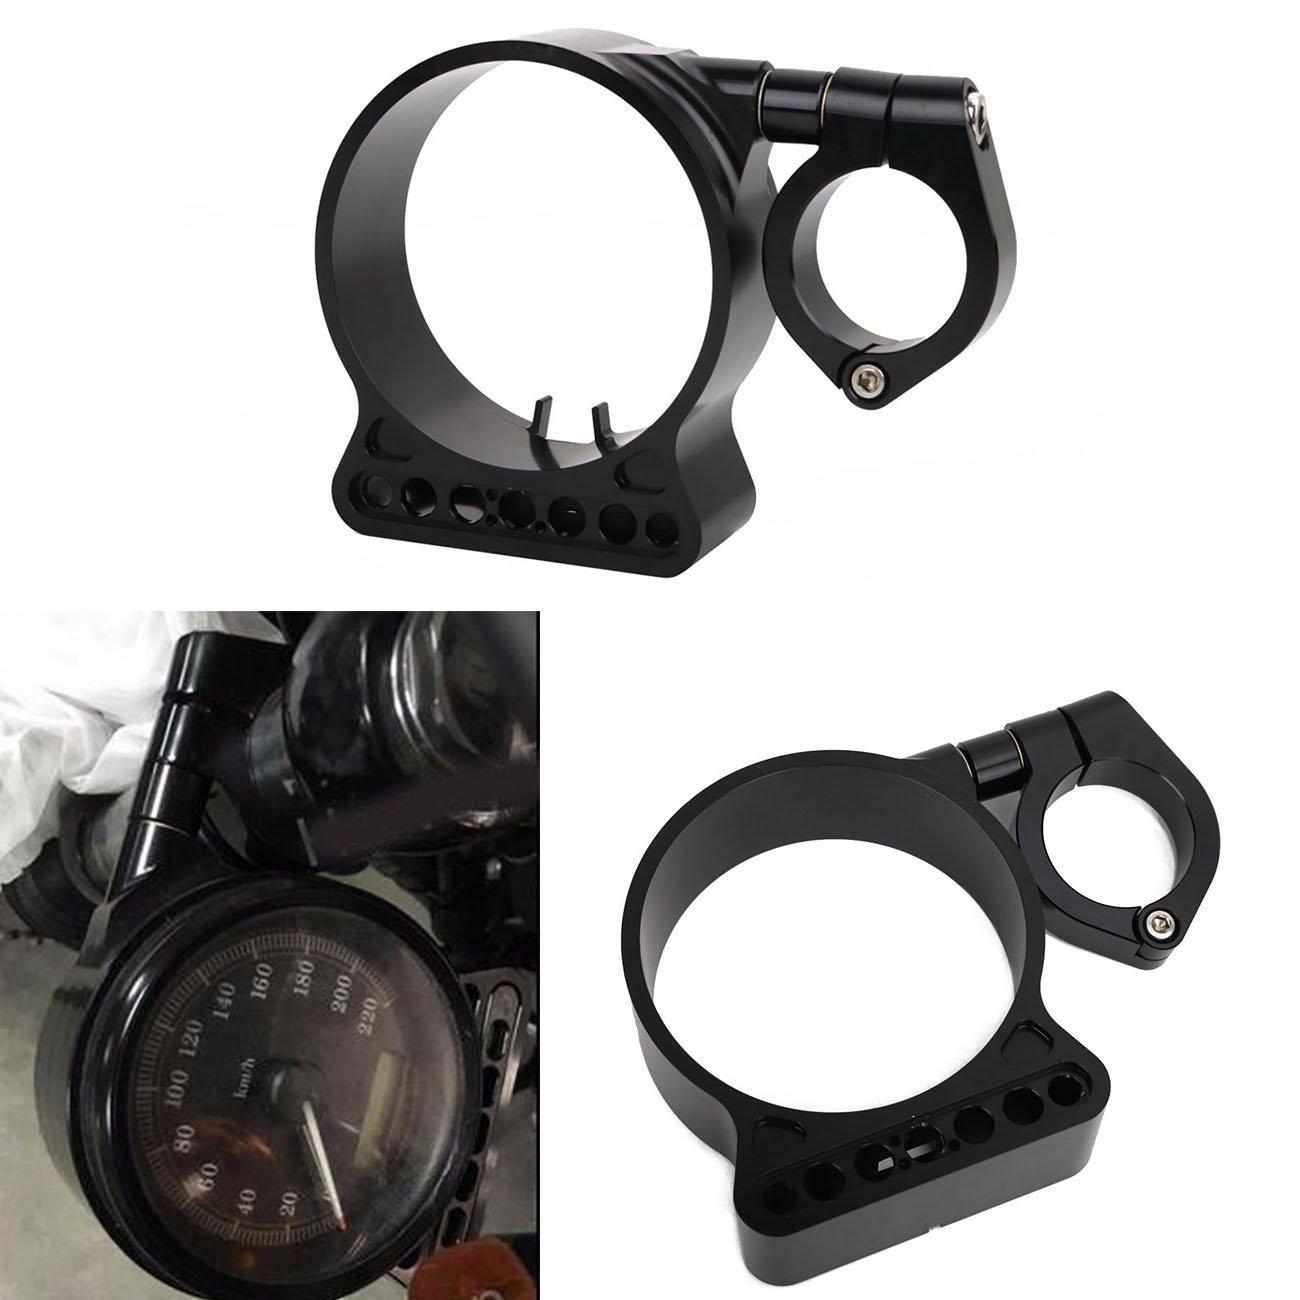 39mm CNC Speedometer Relocation Bracket mount for Harley Sportster XL 883 1200 C N L R 48 (Black)